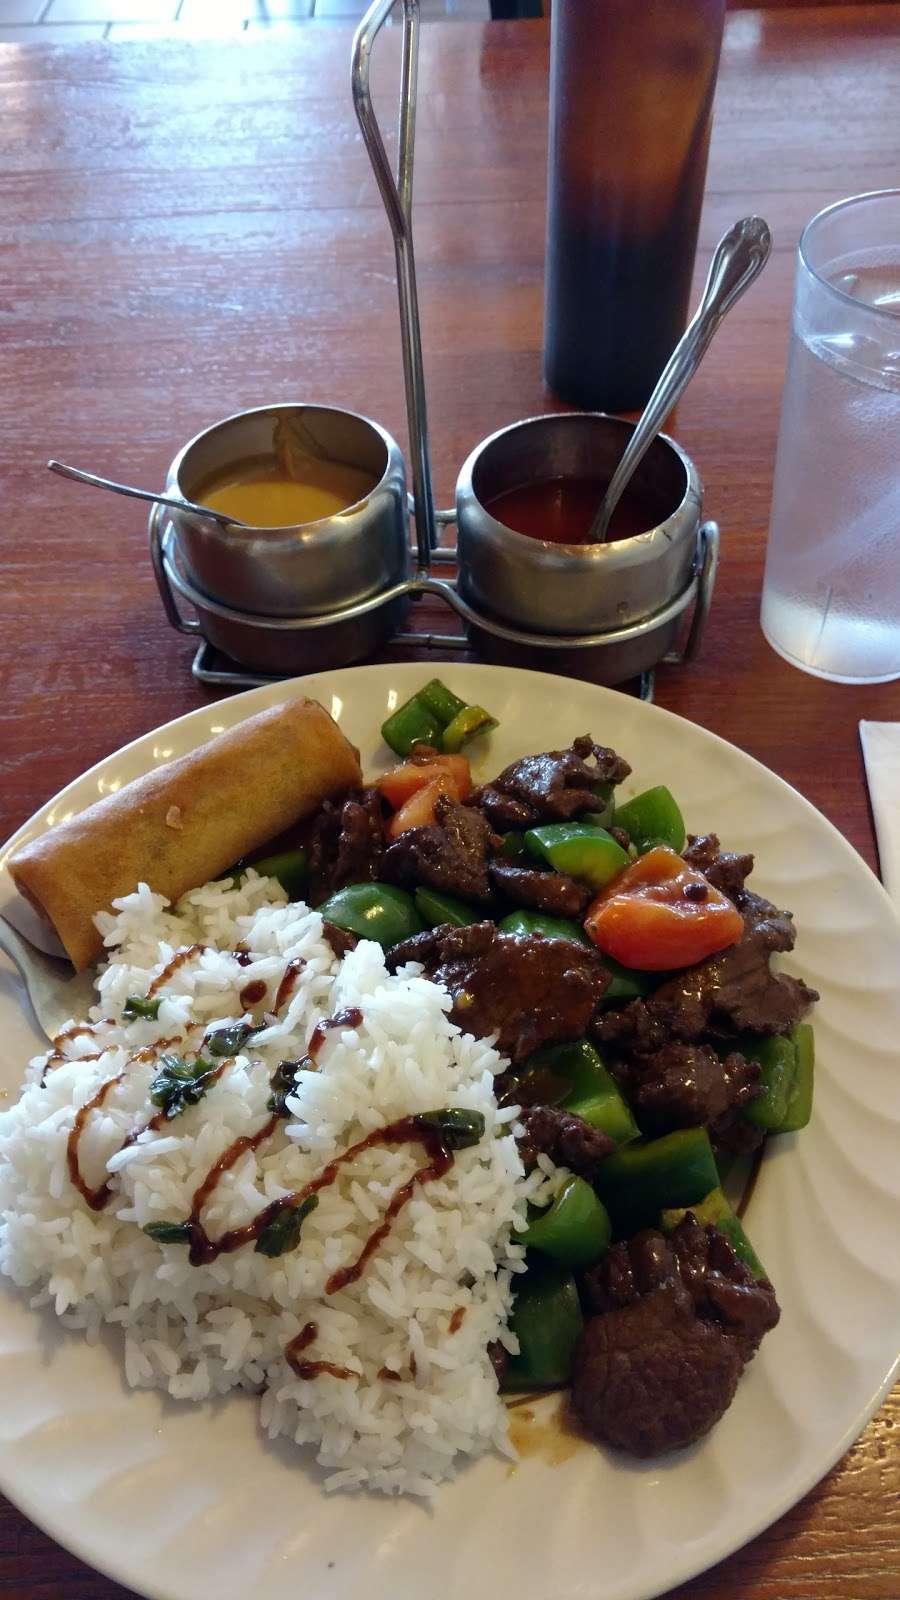 Saigon Panda - restaurant  | Photo 10 of 10 | Address: 3105 80th St, Kenosha, WI 53142, USA | Phone: (262) 697-0880